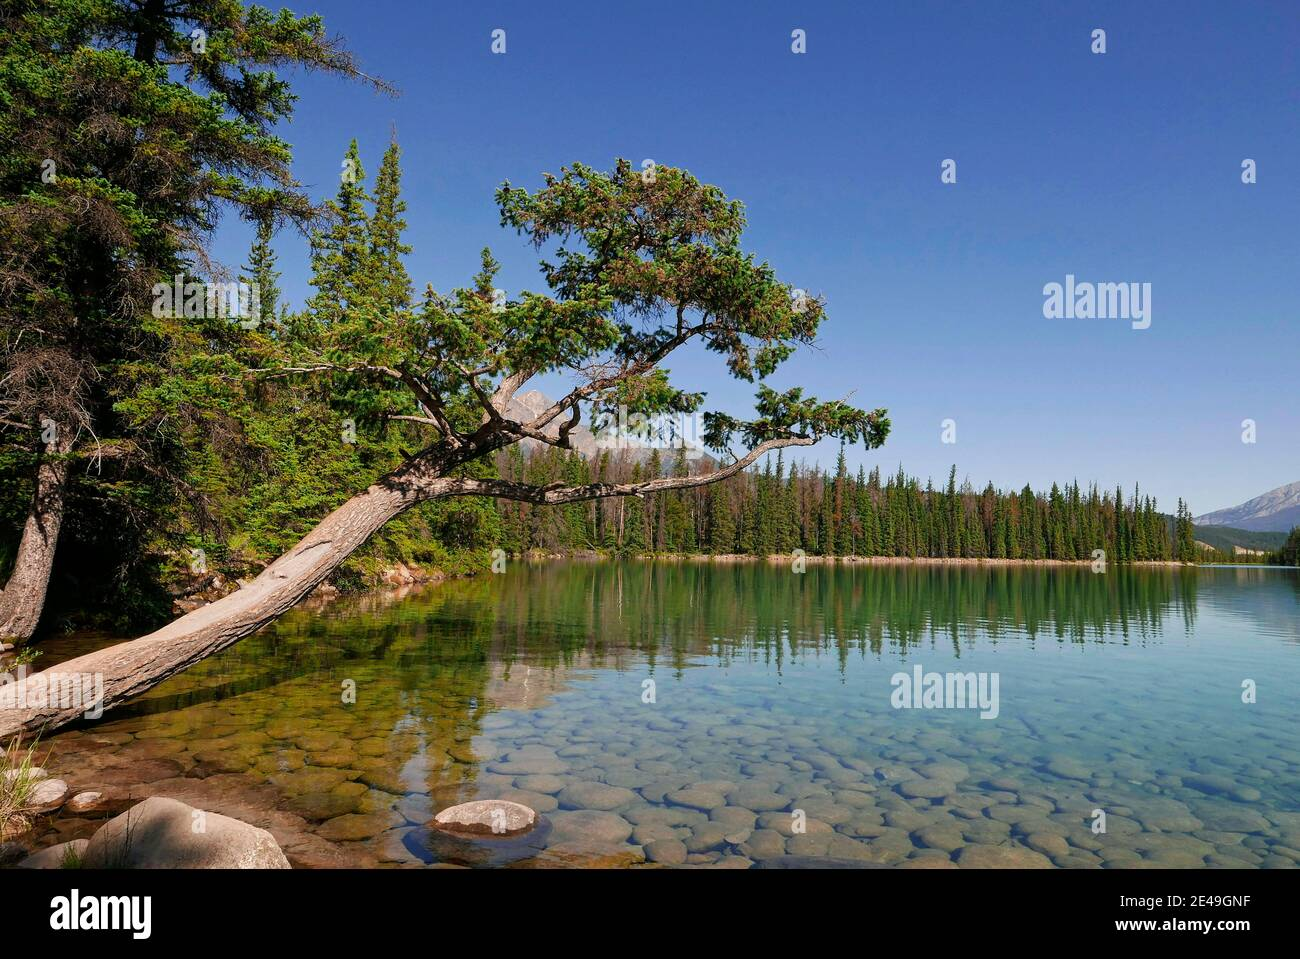 Lago Beauvert cerca de Jasper, Parque Nacional Jasper, Montañas Rocosas, Alberta, Canadá Foto de stock